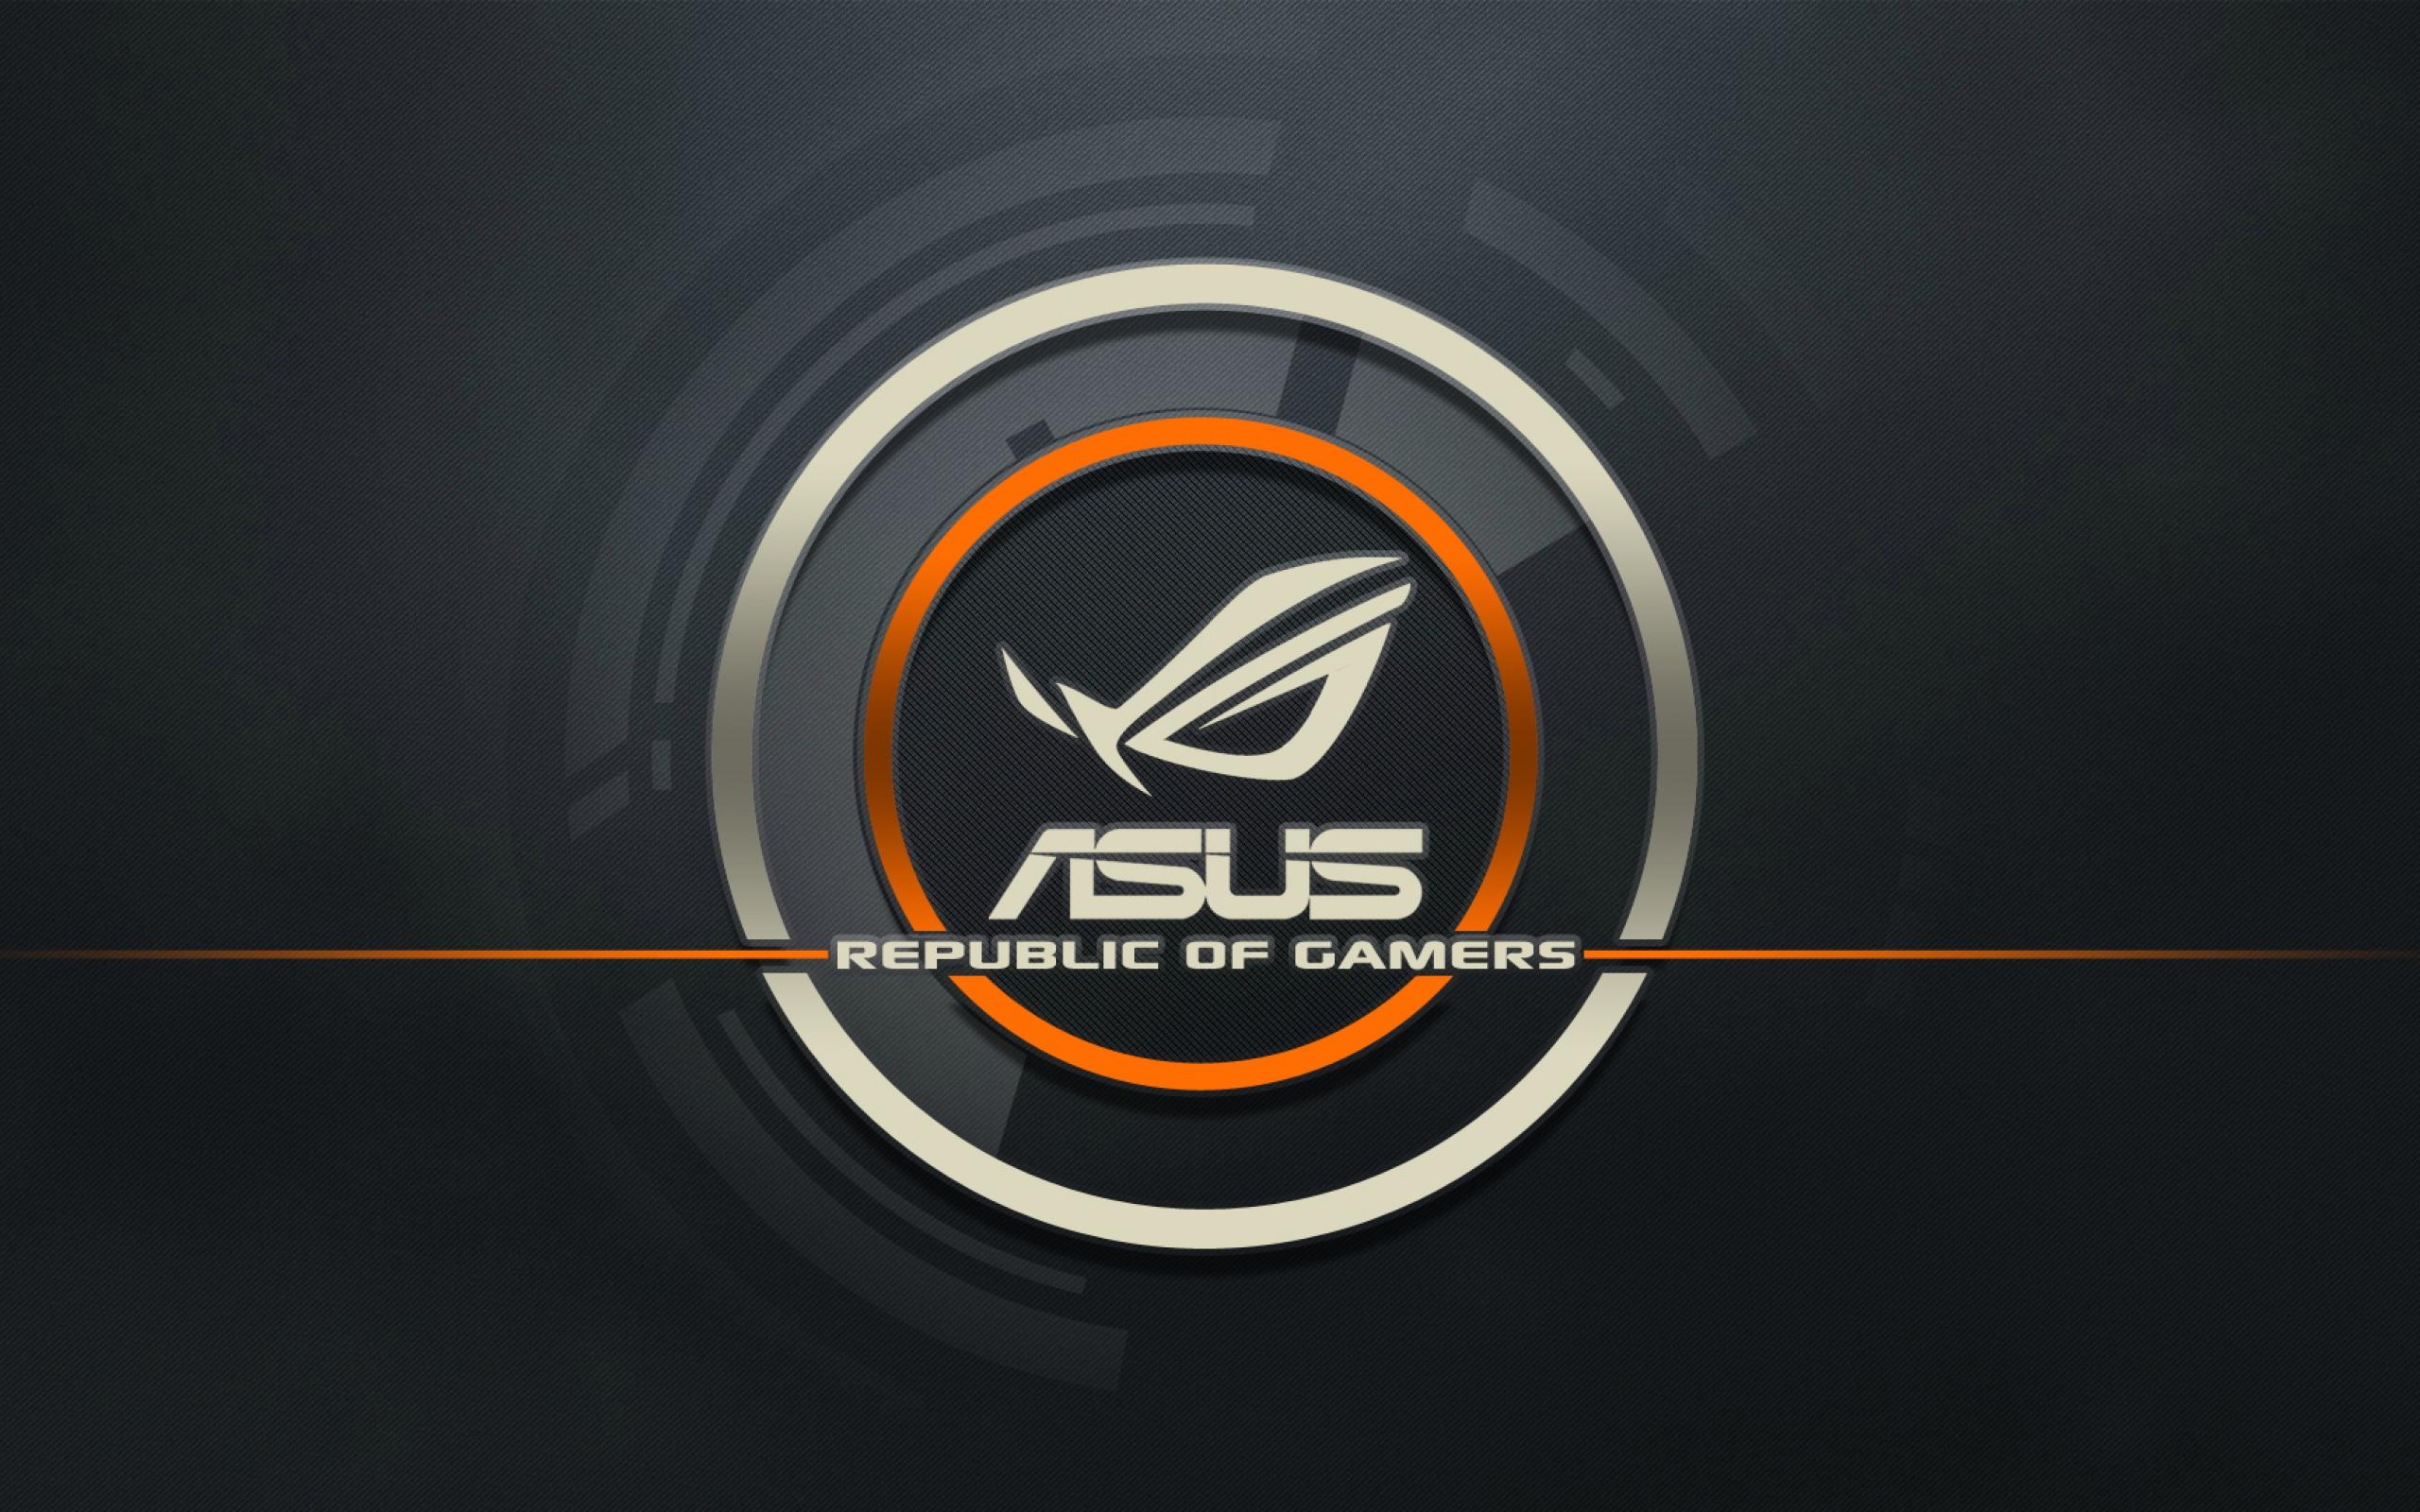 Wallpaper Asus, Logo, Republic Of Gamers, Computer - Ultra Hd 4k Asus , HD Wallpaper & Backgrounds